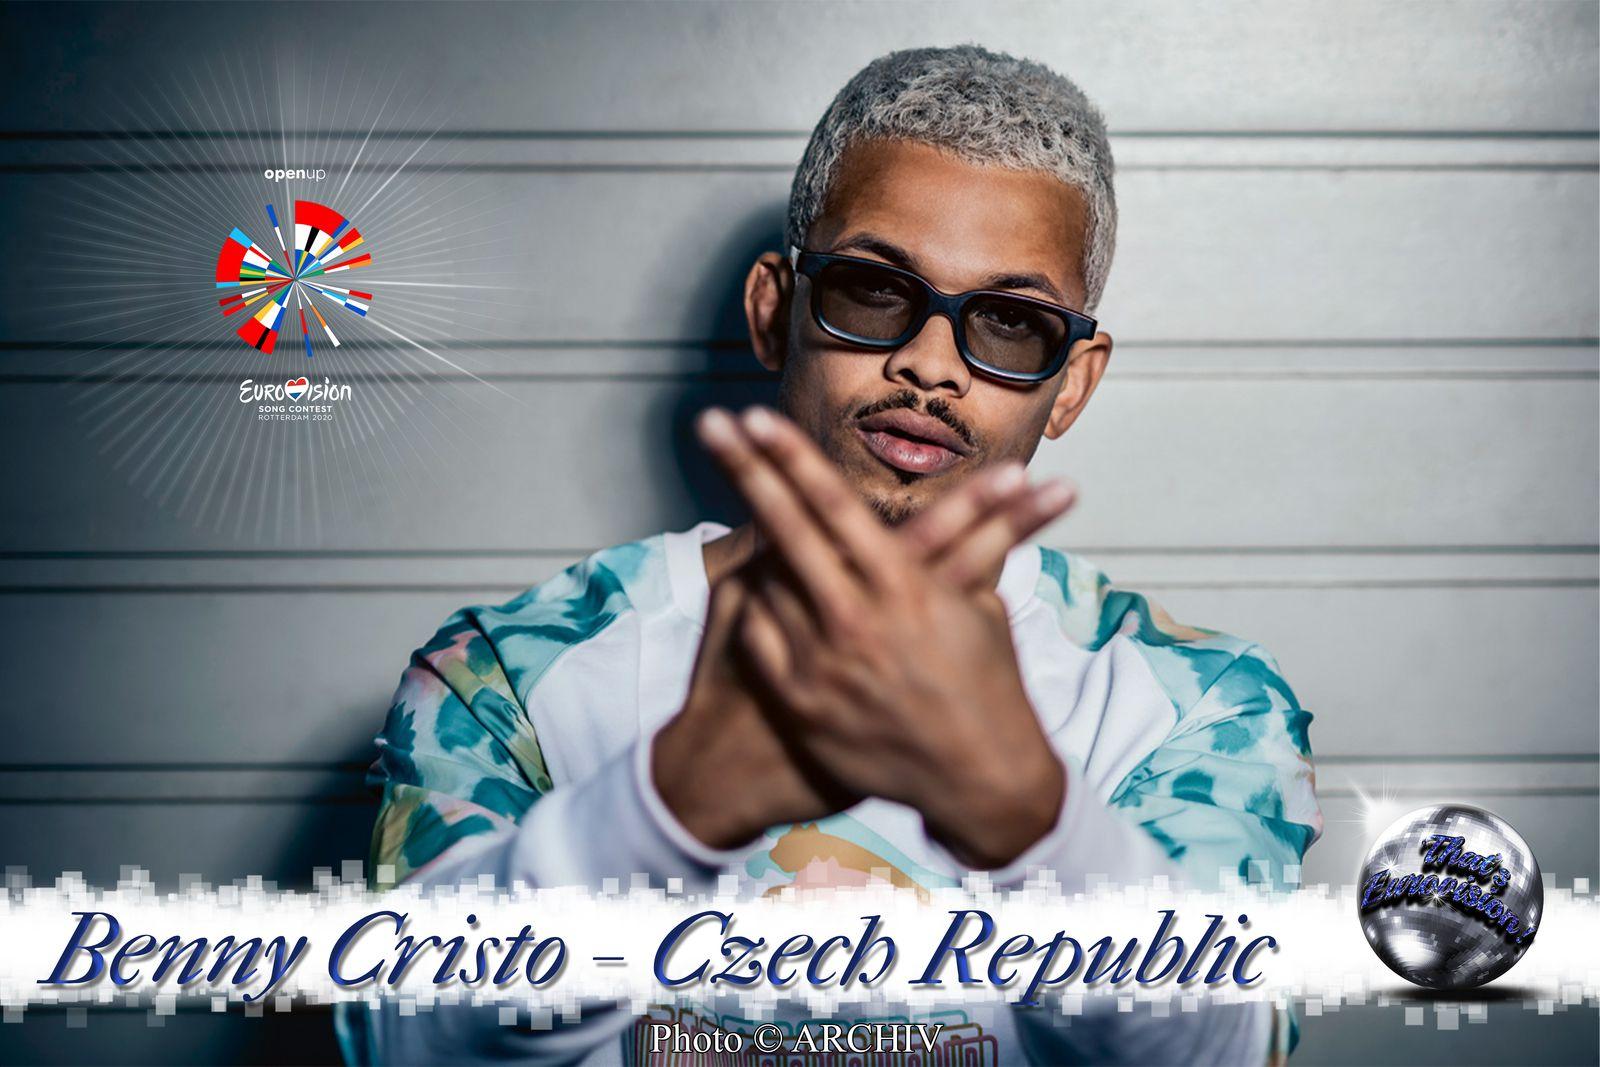 Czech Republic 2020 - Benny Cristo (Kemama)